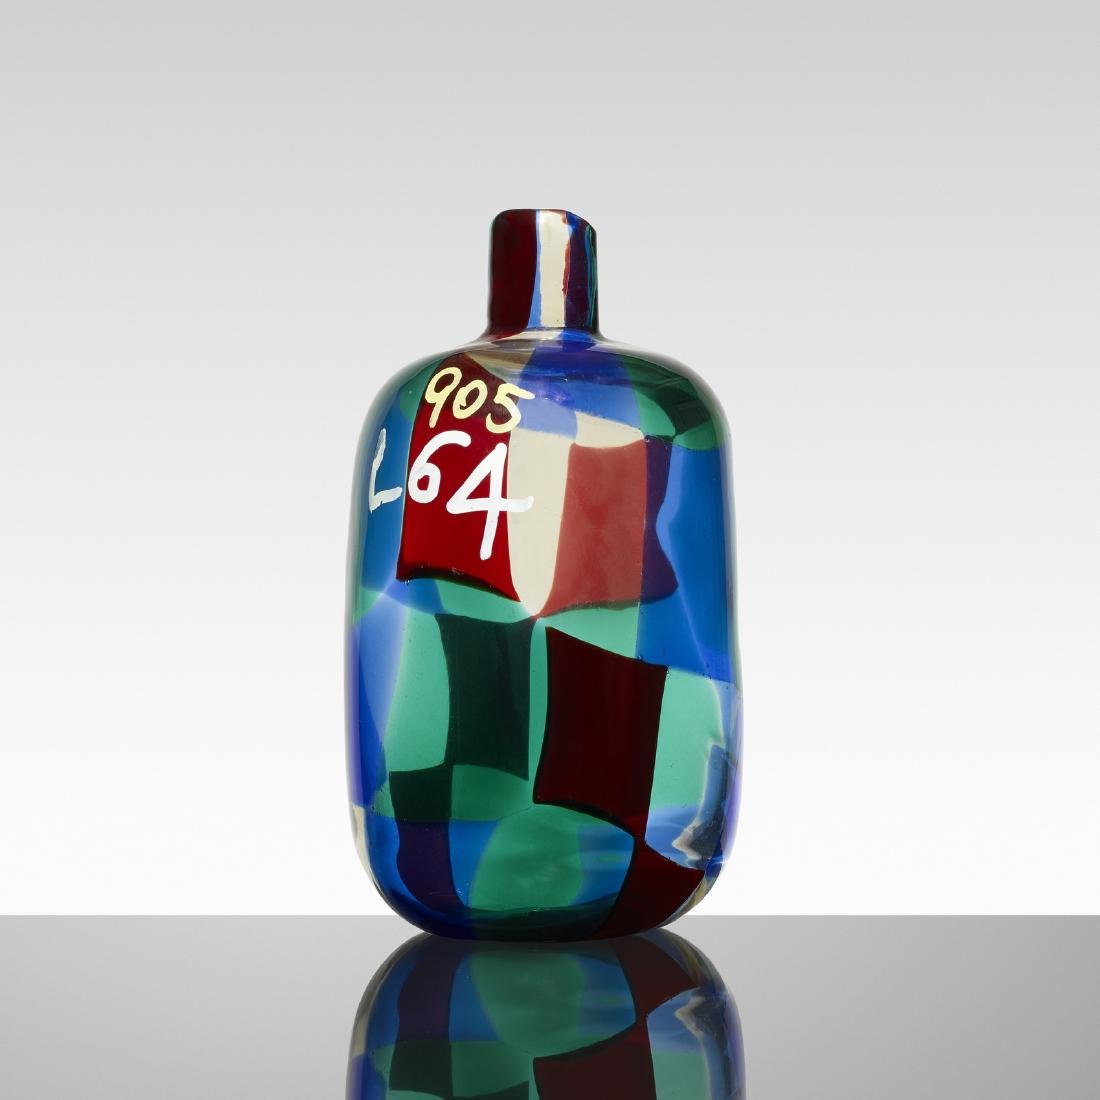 Fulvio Bianconi, prototype Pezzato vase, model 905 L64 - 2